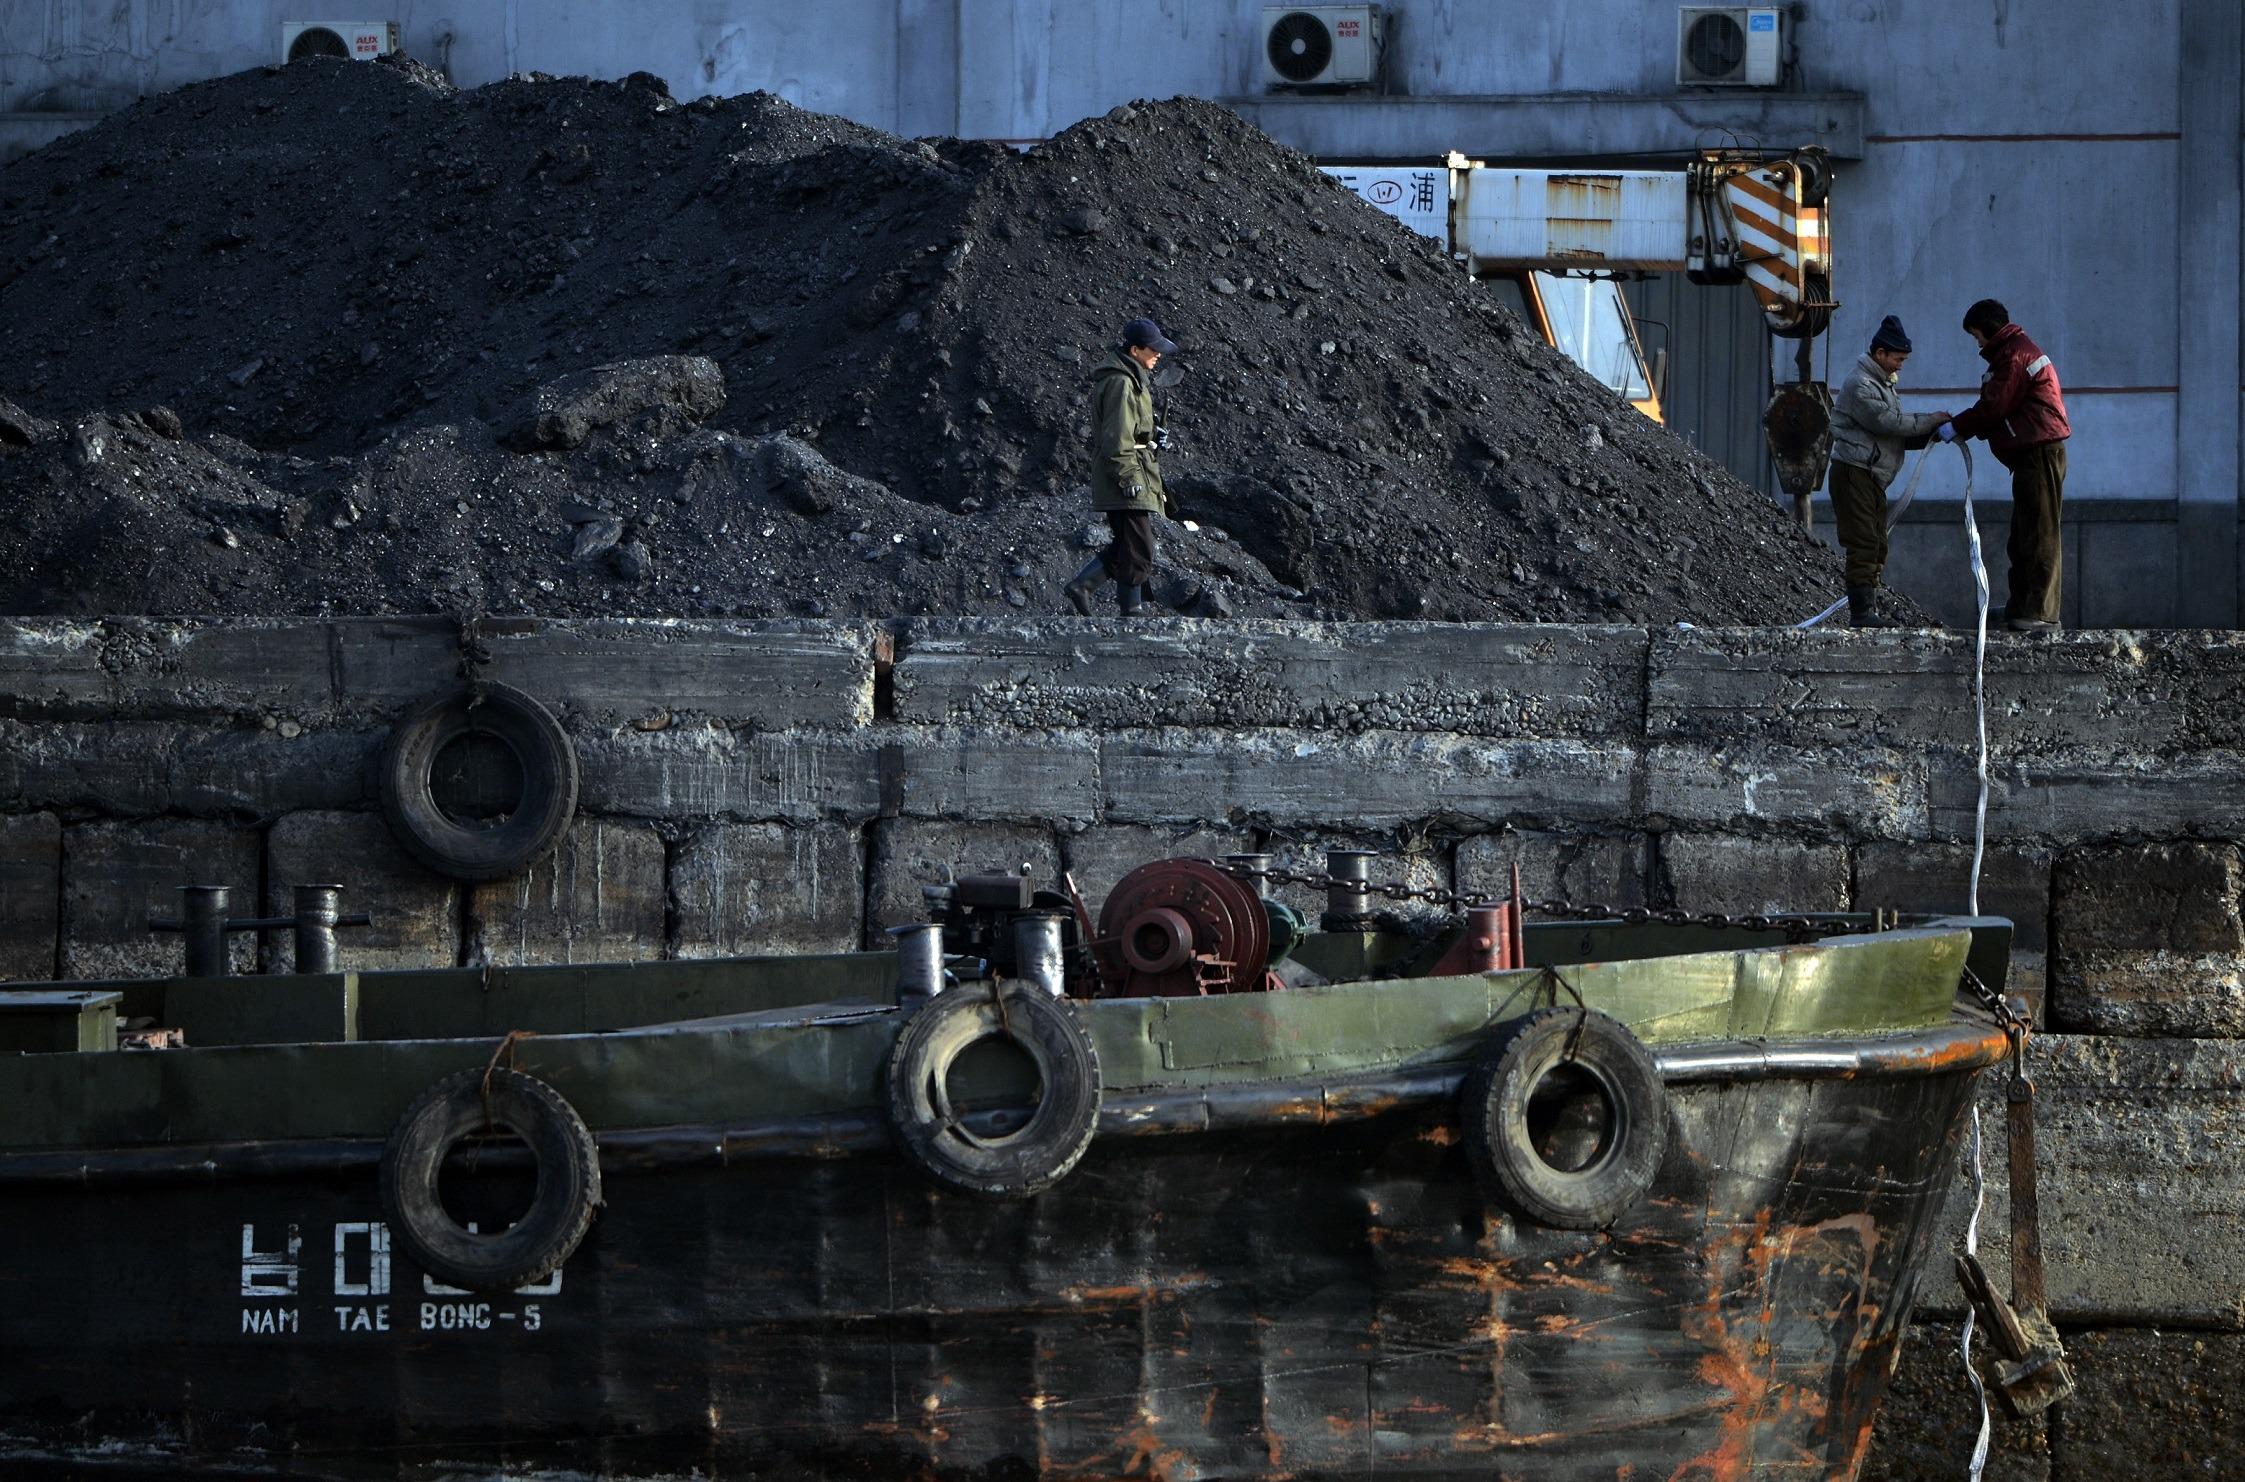 North Korean laborers near ship